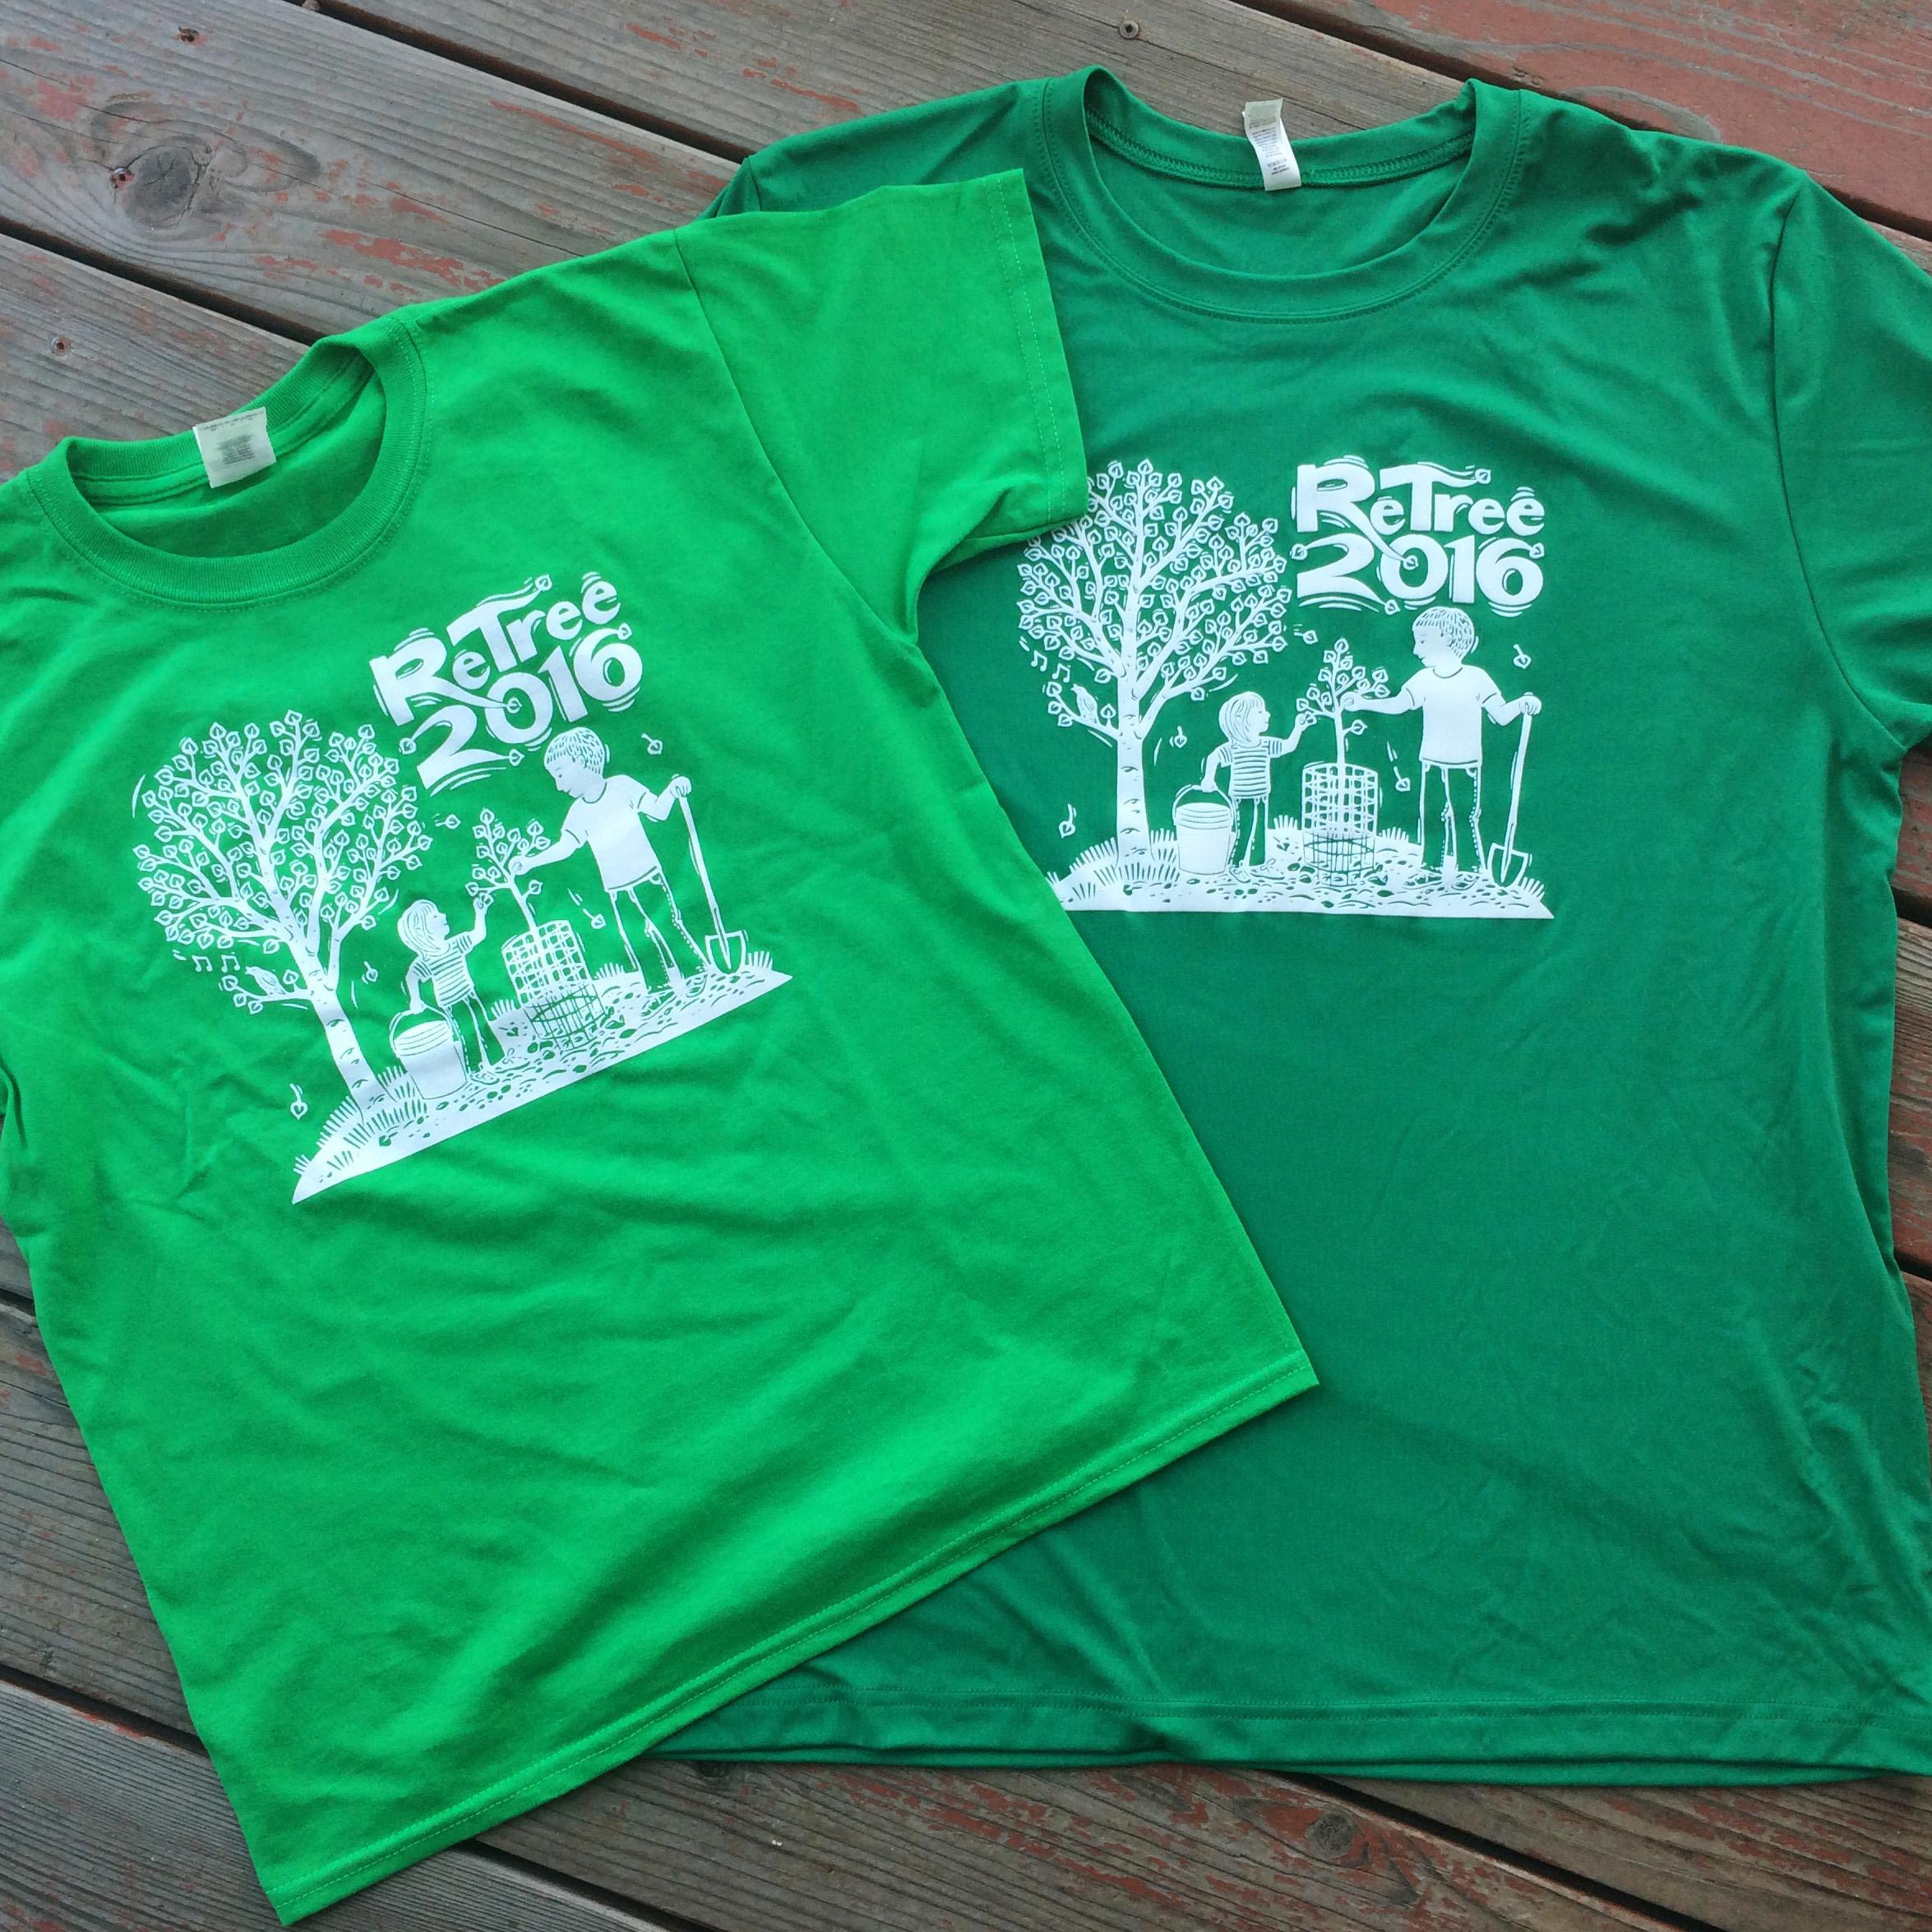 ReTree 2016 t-shirts